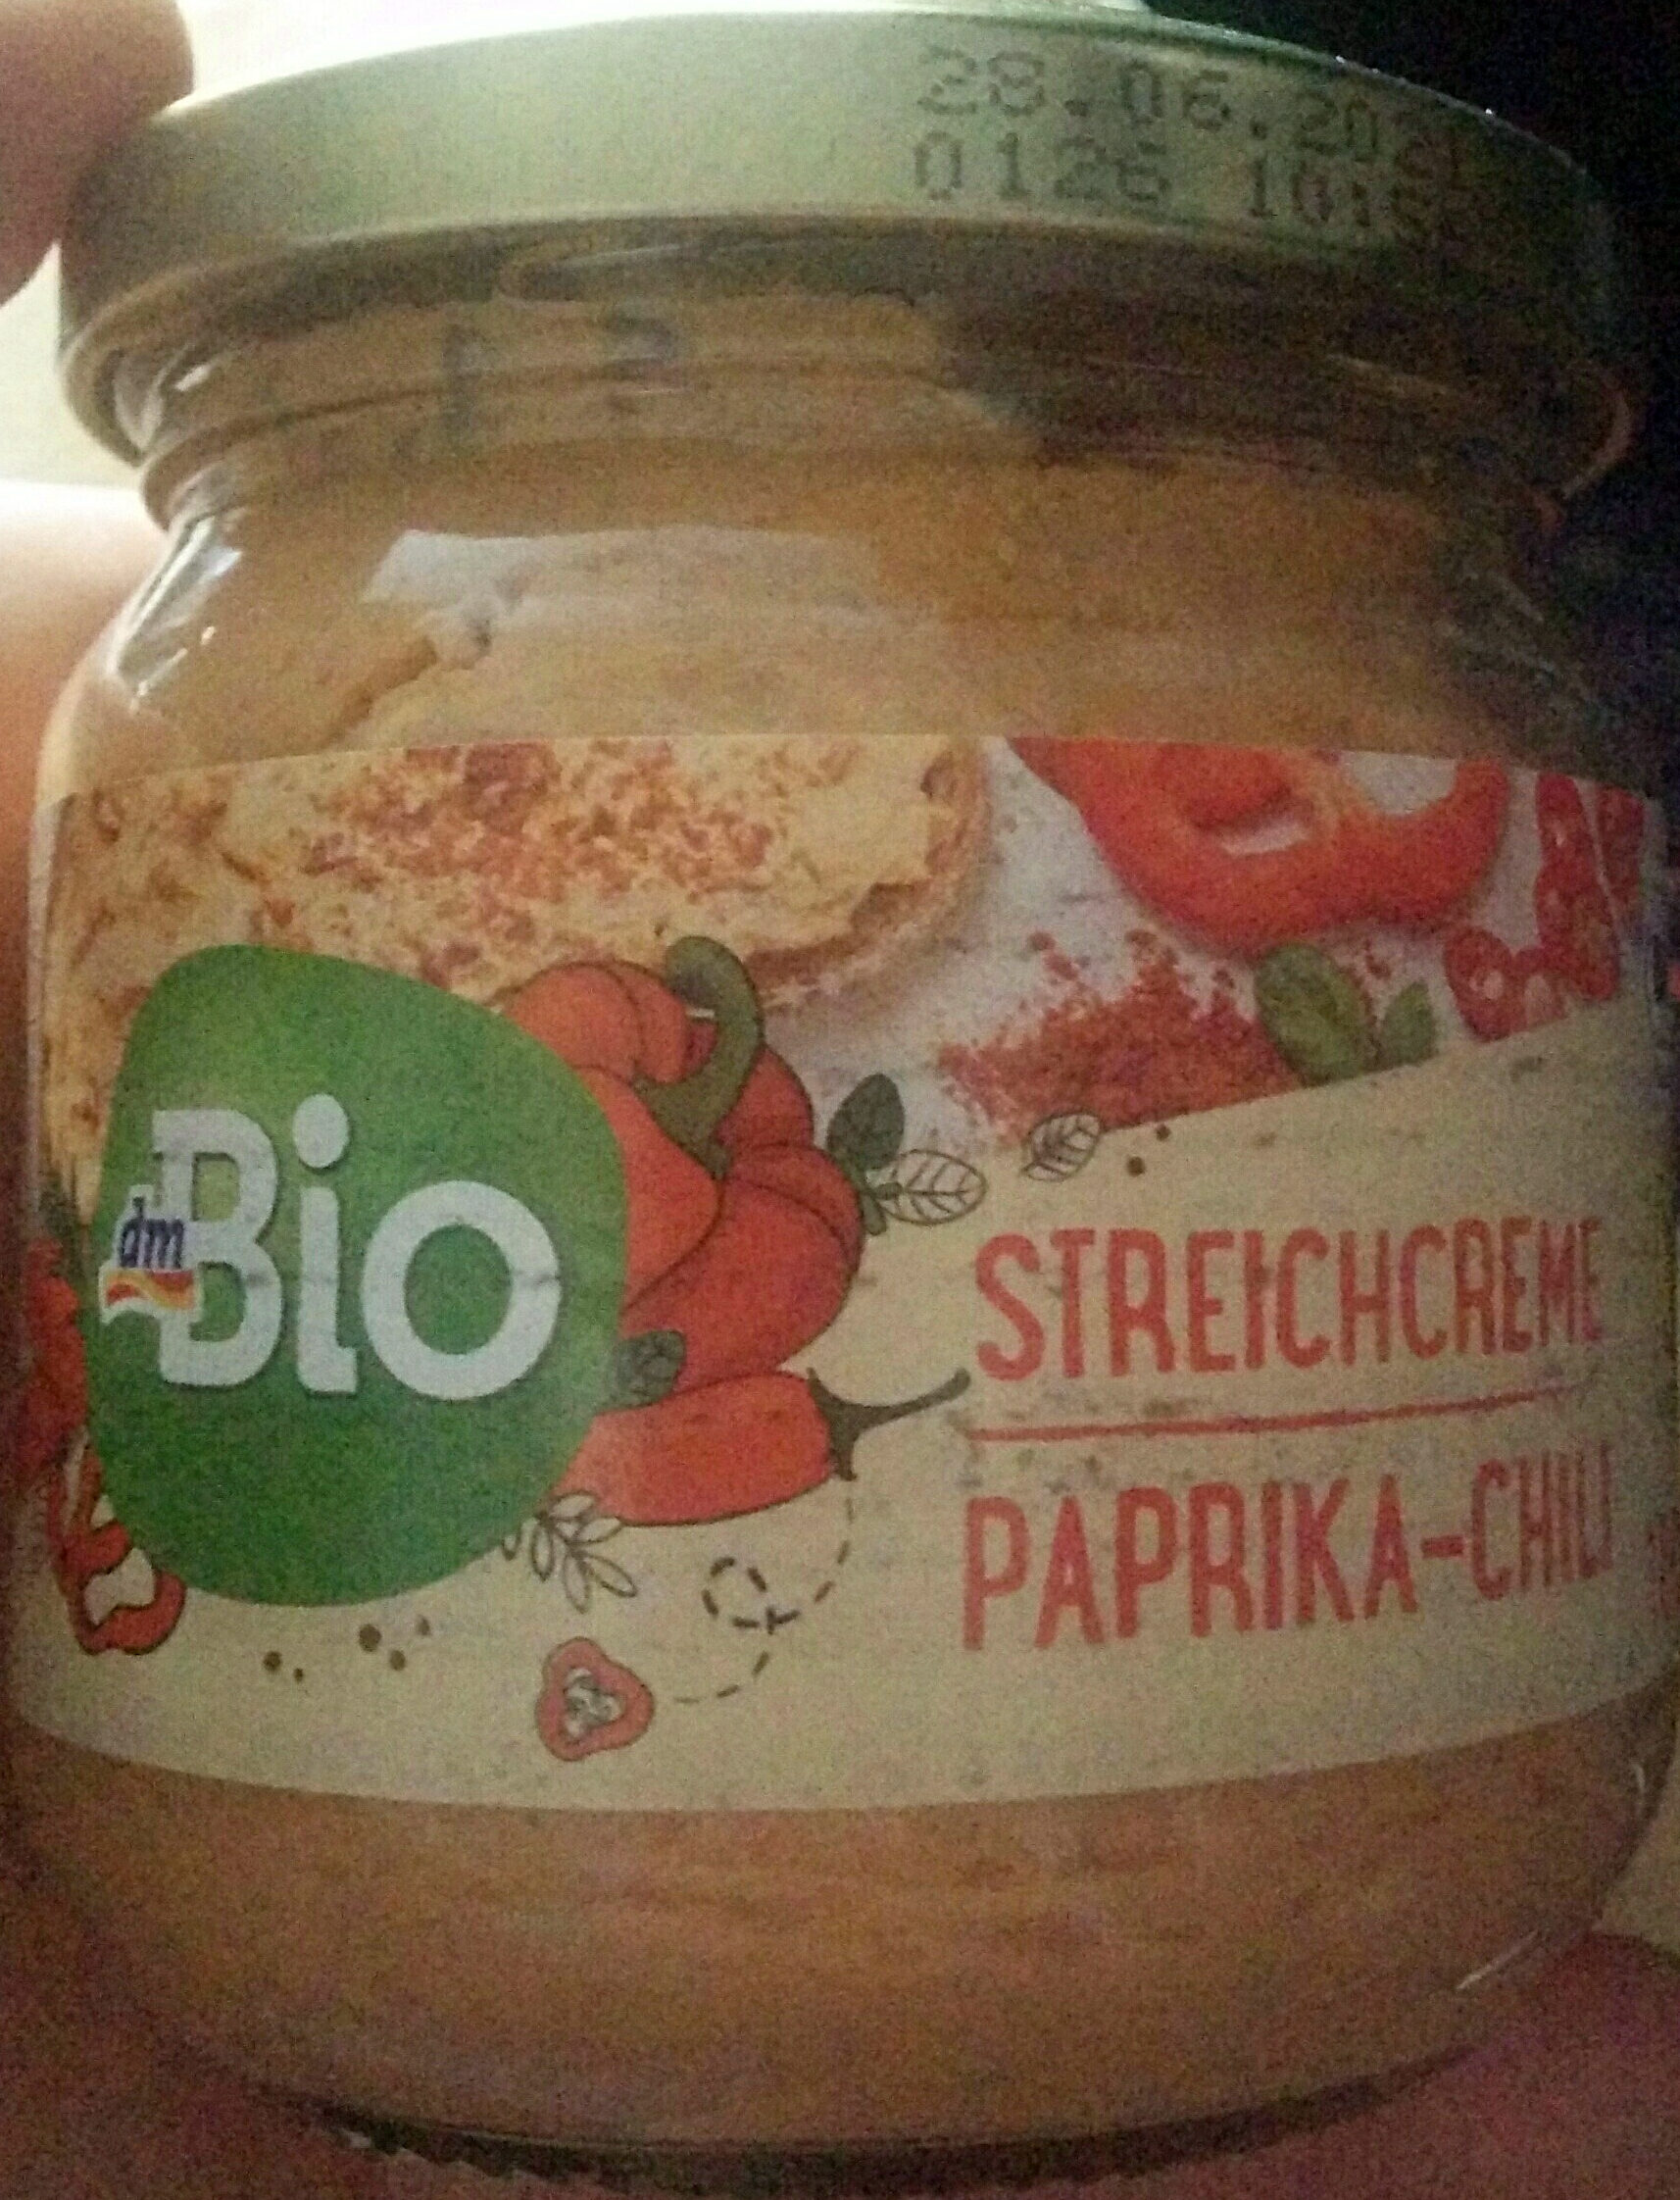 Streichcreme Paprika-Chili - Produit